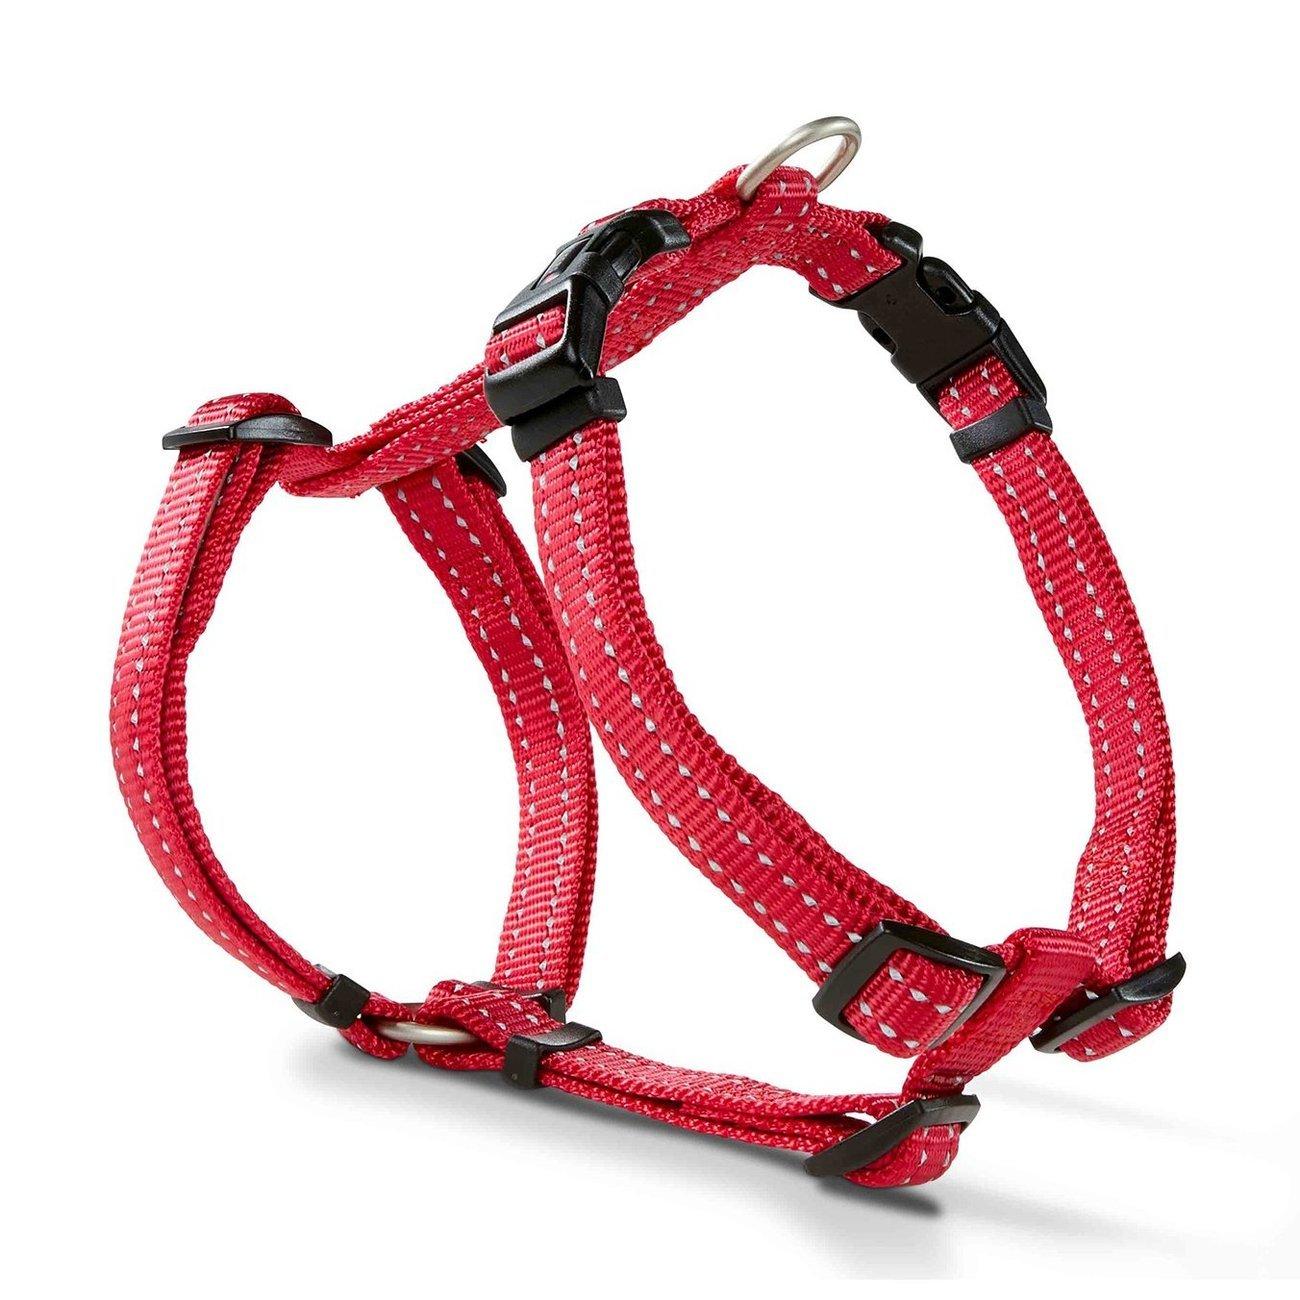 Wolters Hundegeschirr Soft & Safe Professional, Bild 7